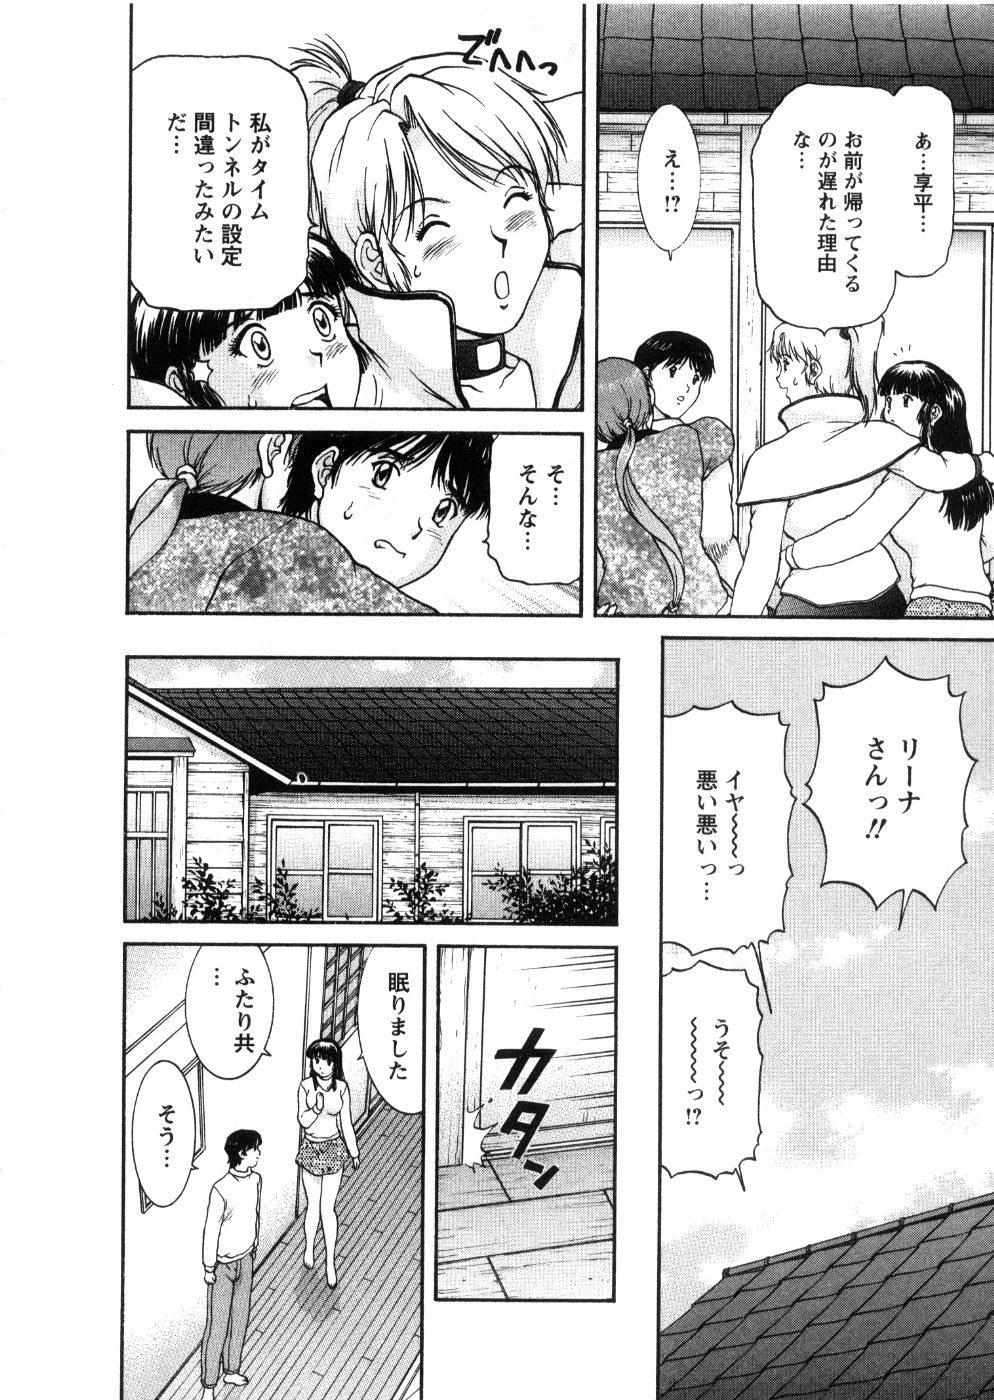 Oneechan-tachi ga Yatte Kuru 03 57